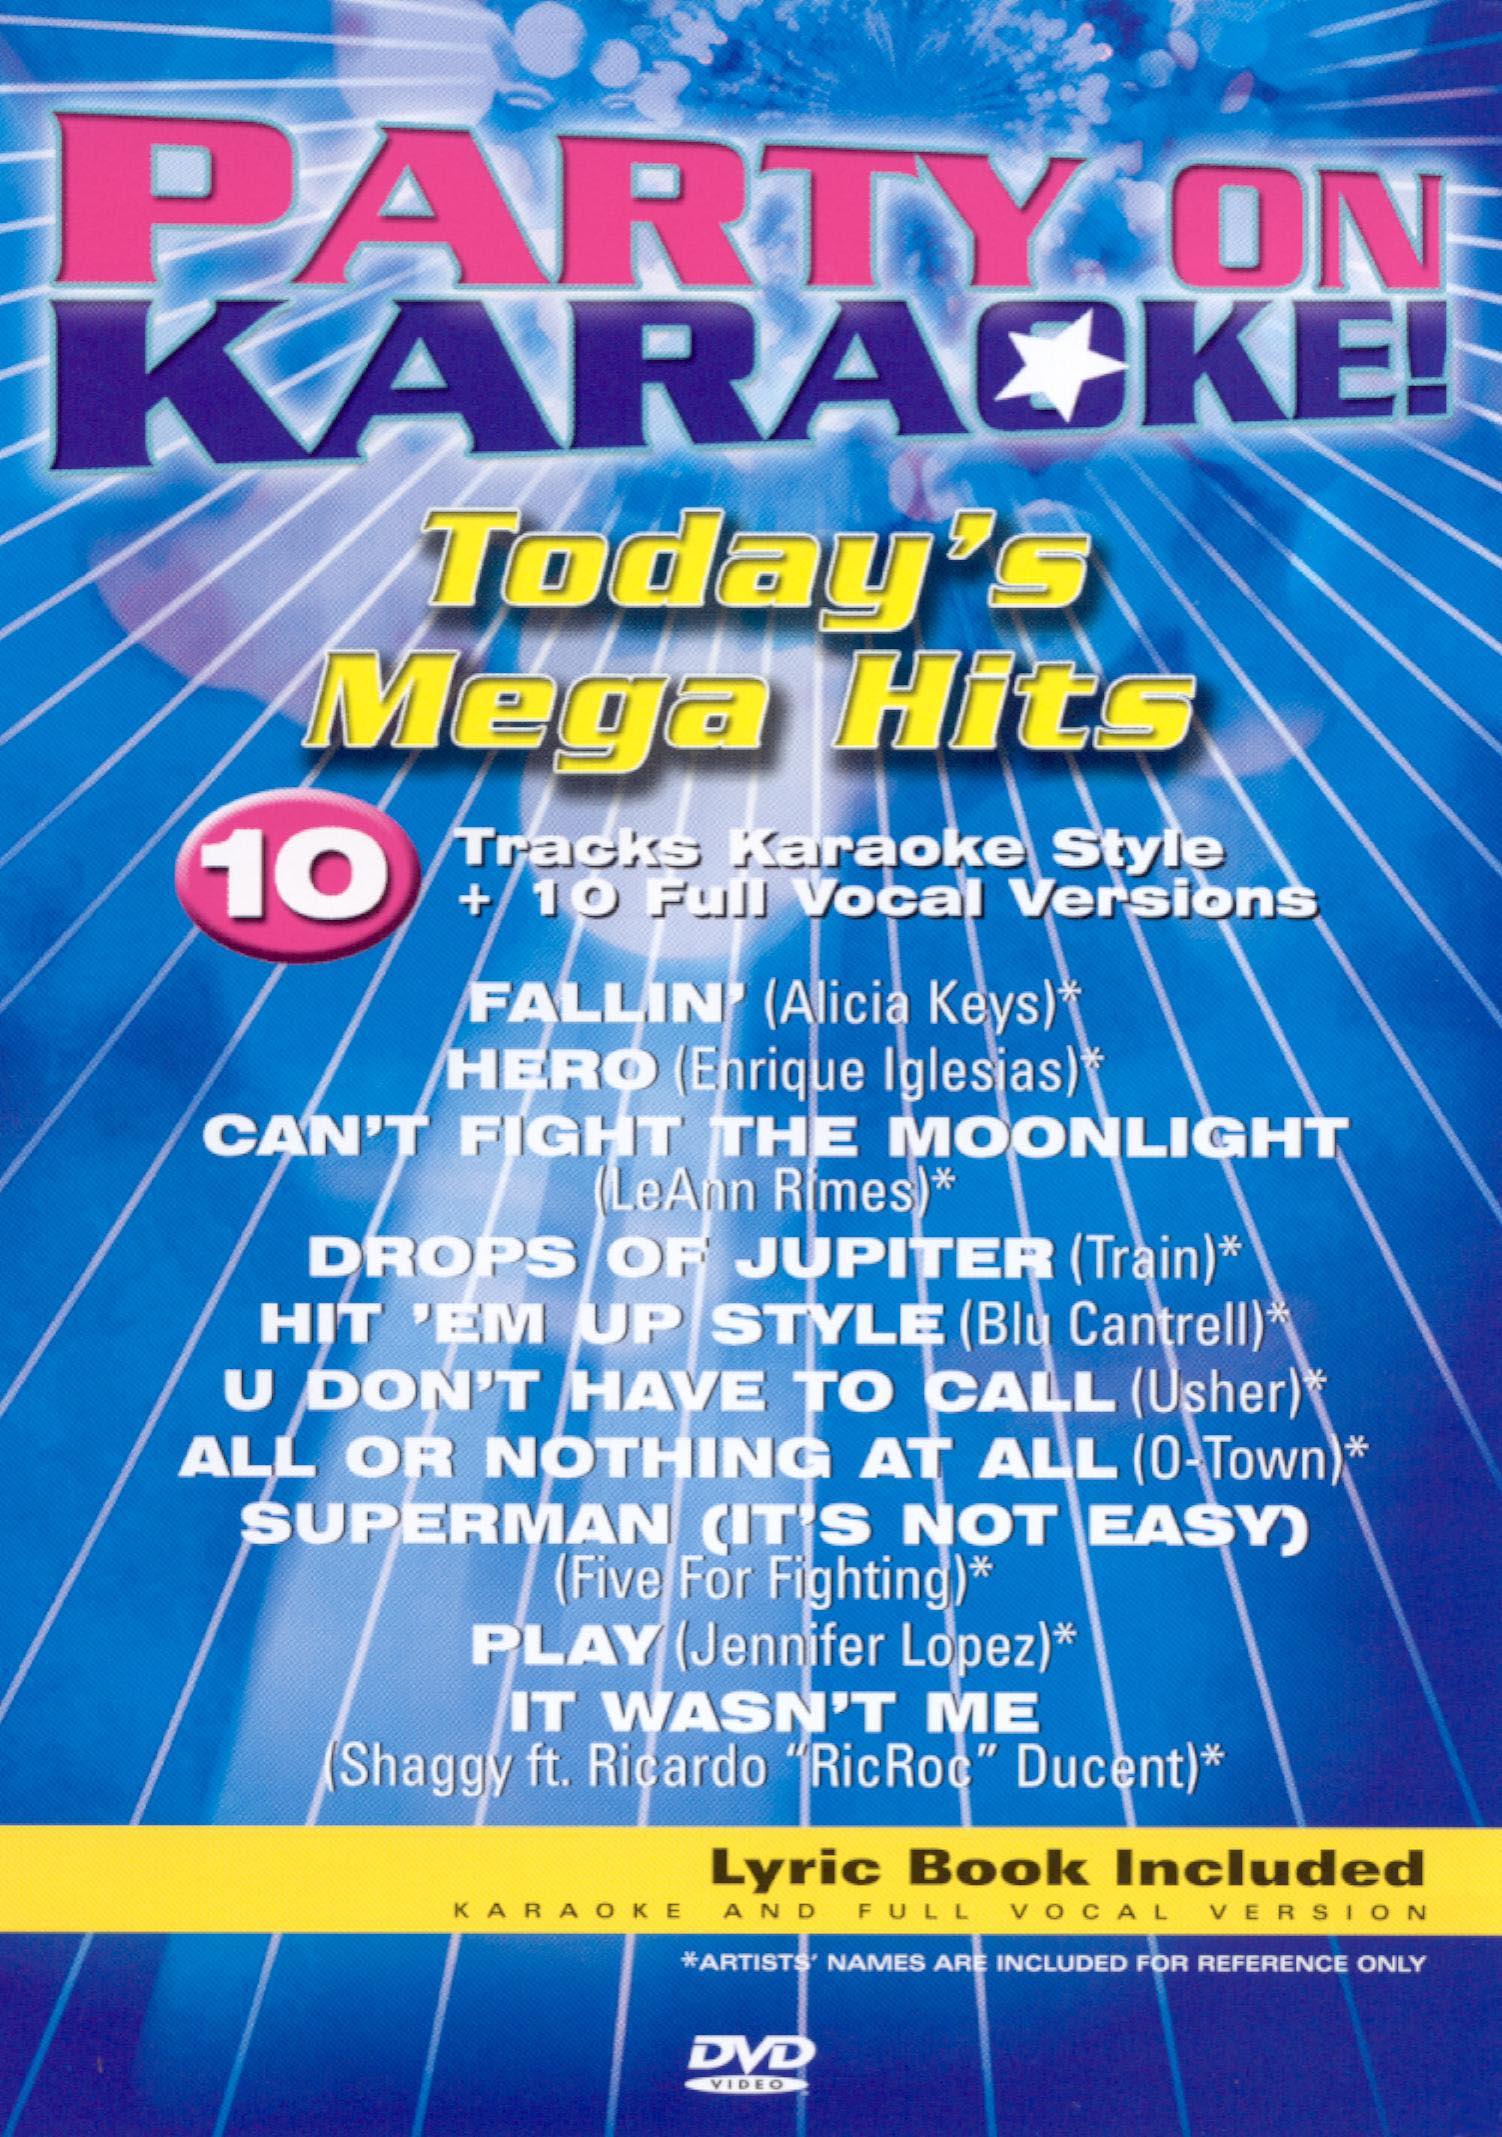 Party On Karaoke! Today's Mega Hits